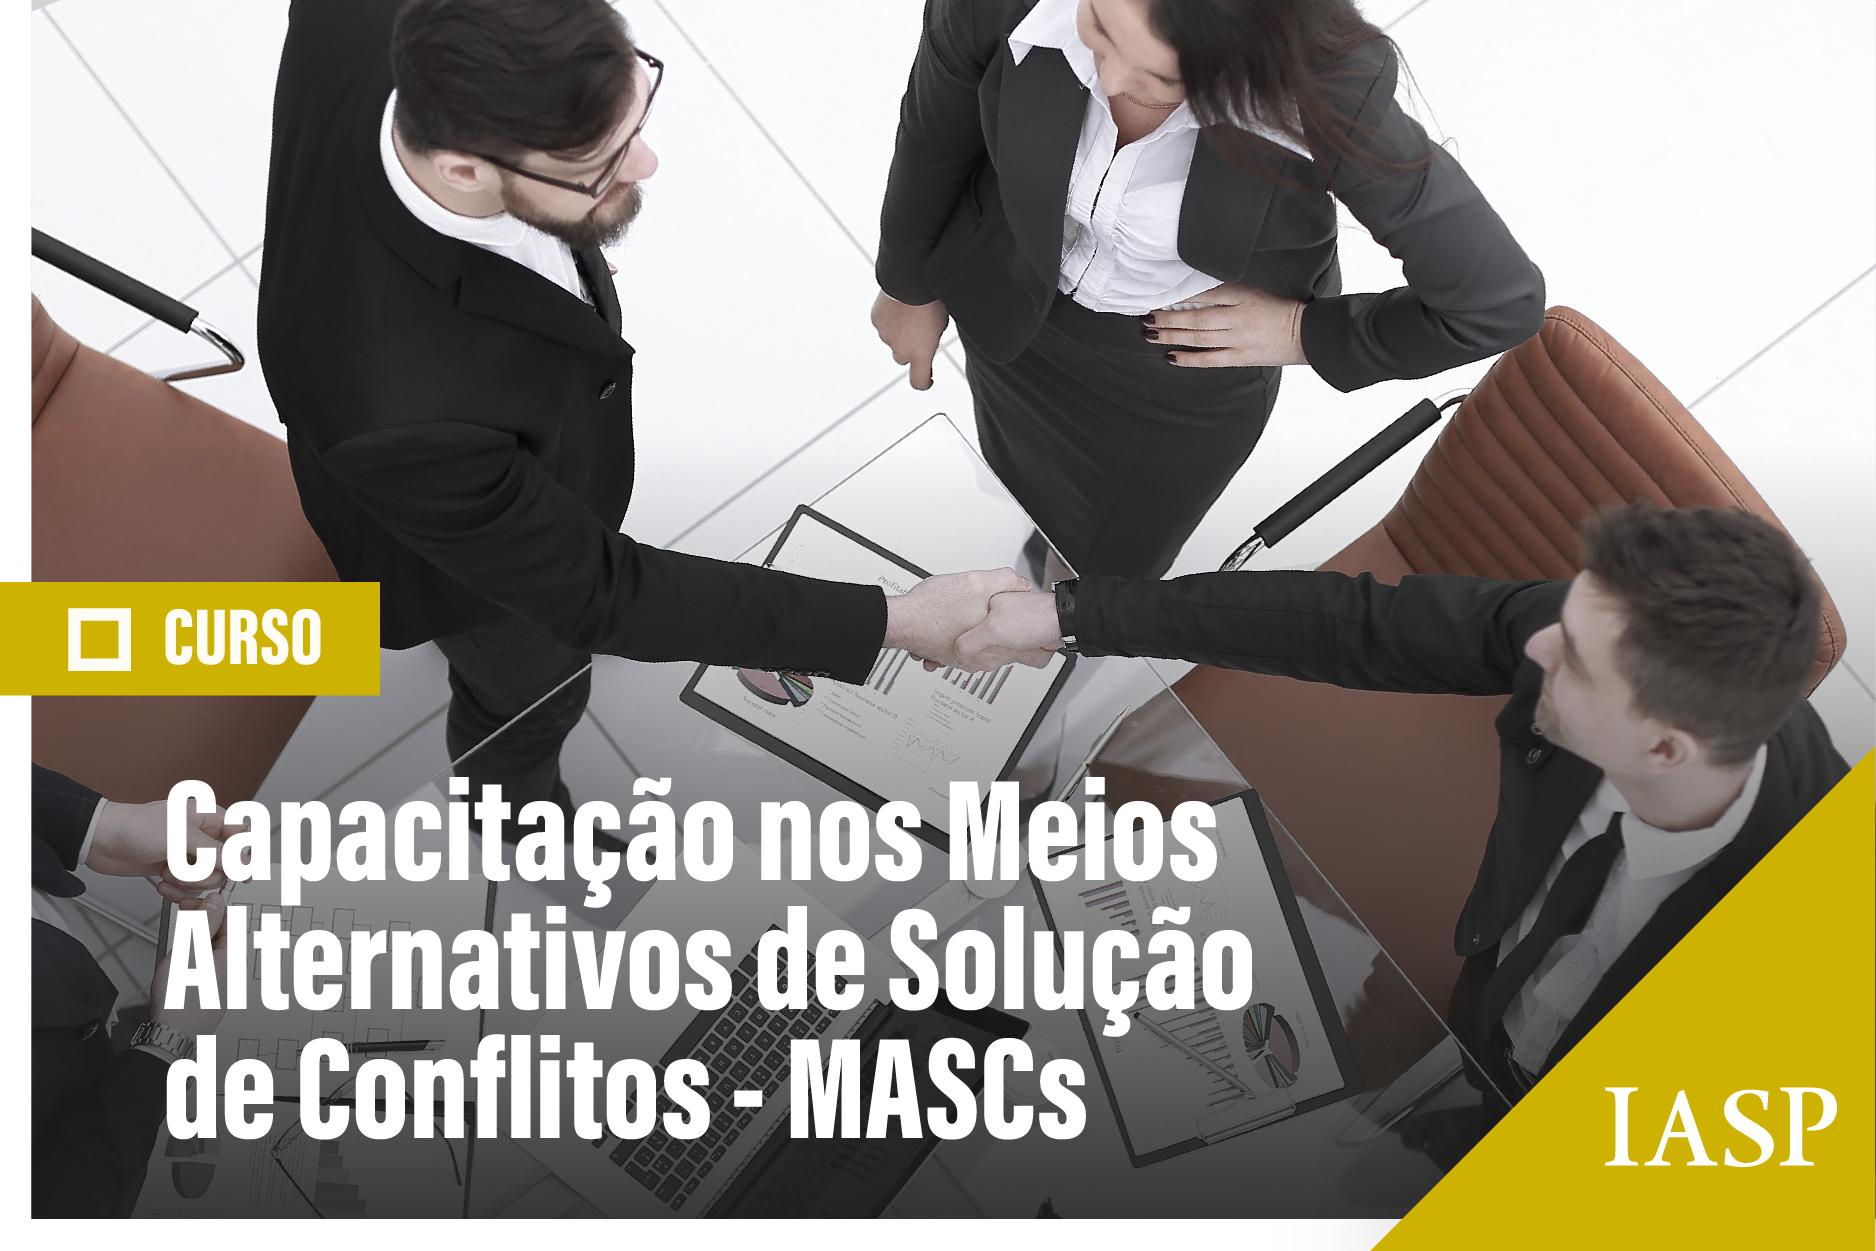 IASP_CURSO_CAPACITACAO_02-01.jpg